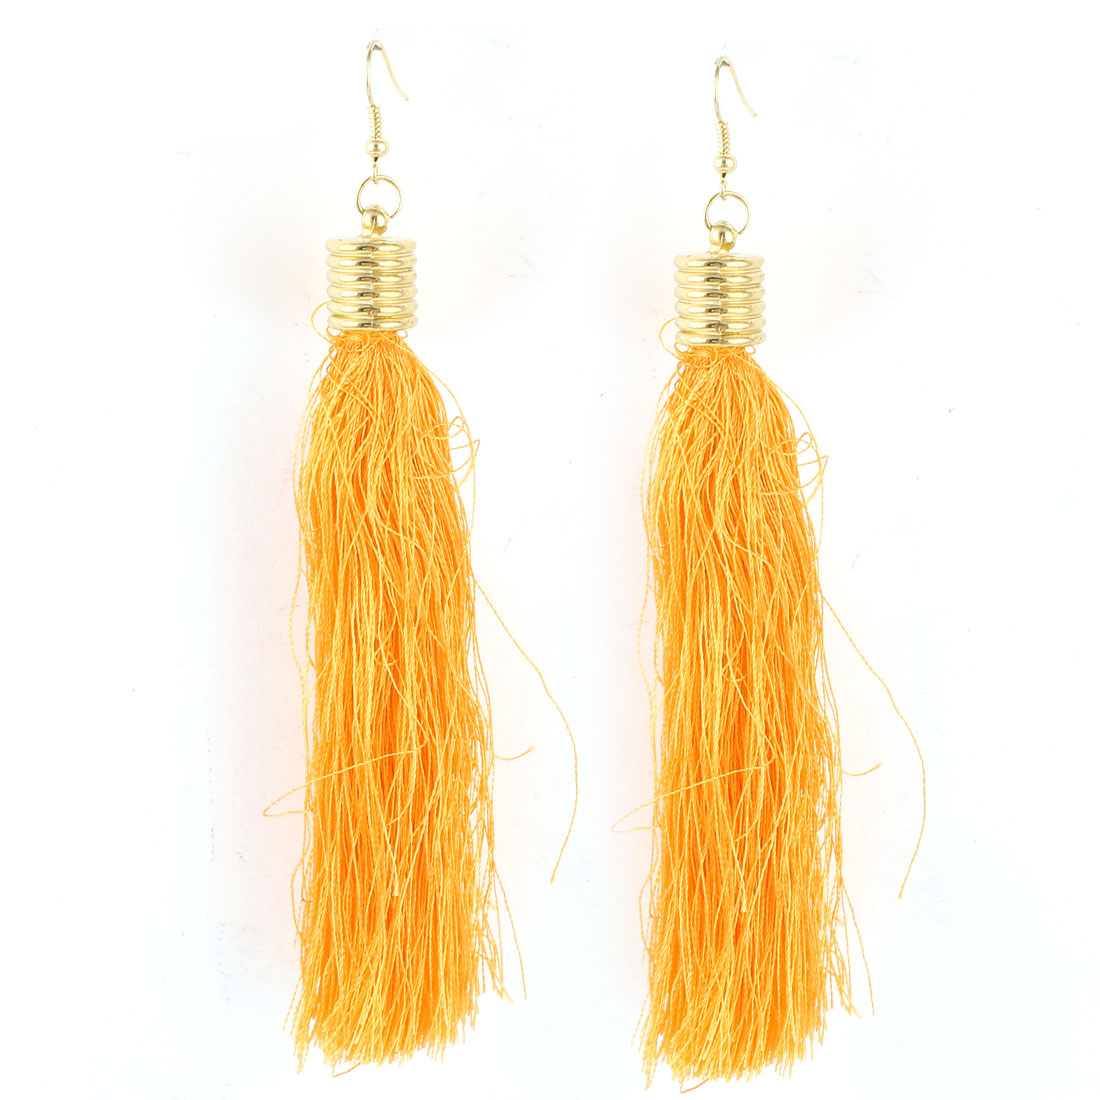 Ladies Ear Decoration Nylon Tassels Pendant Fish Hook Earrings Orange Pair